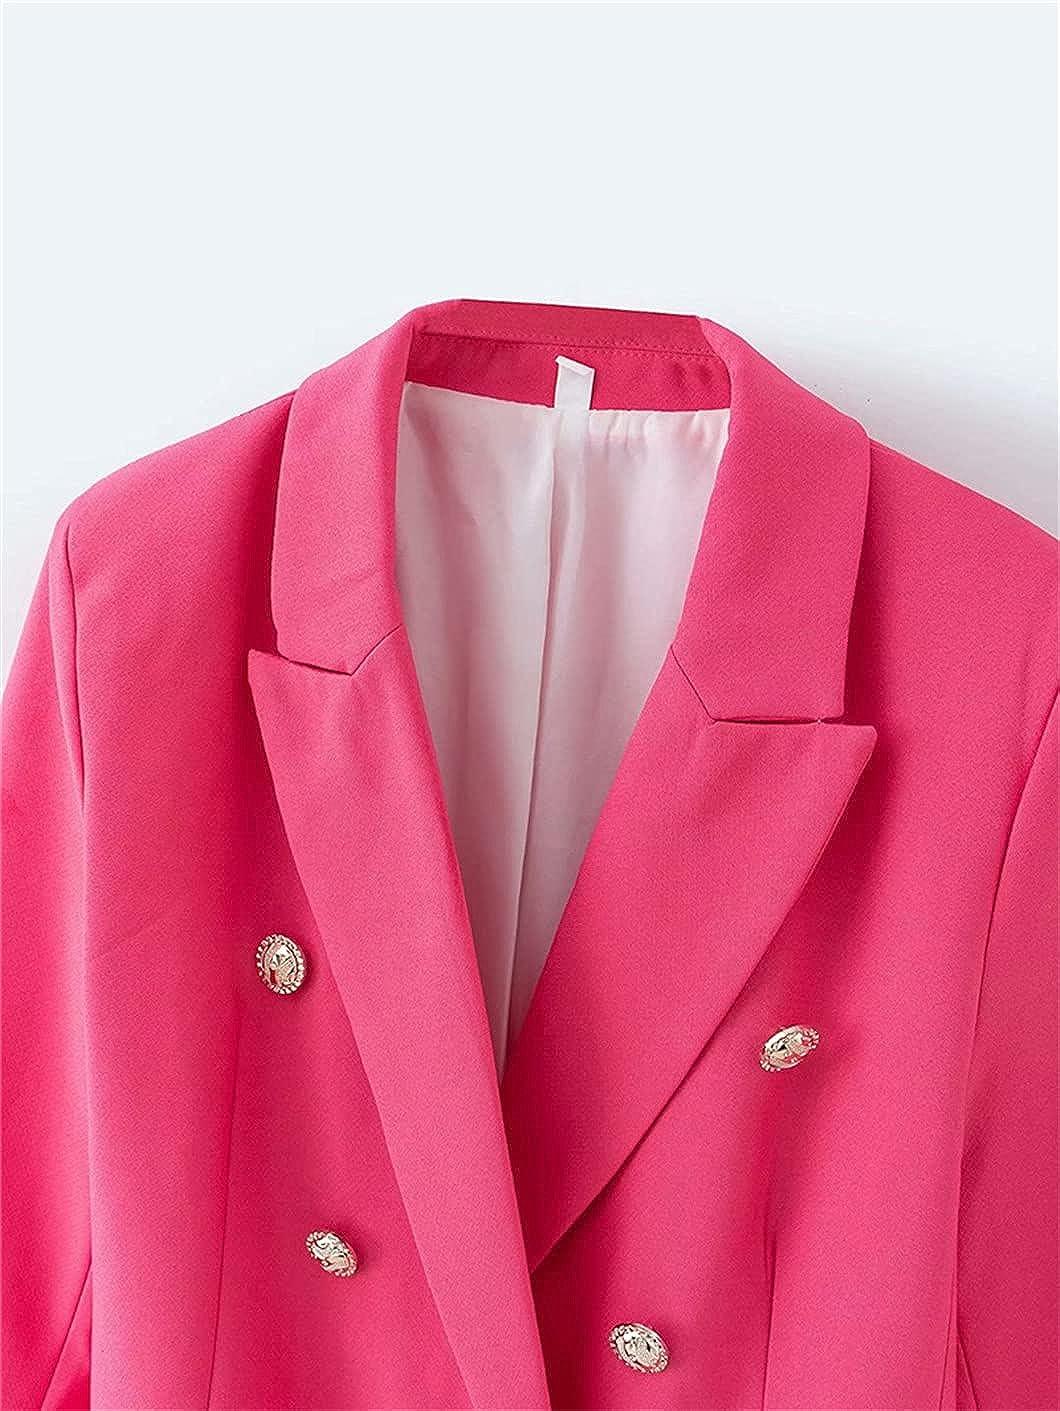 Women Chic Button Blazer Ladies Jackets Casual Female Slim Suits Girls Chic Sets